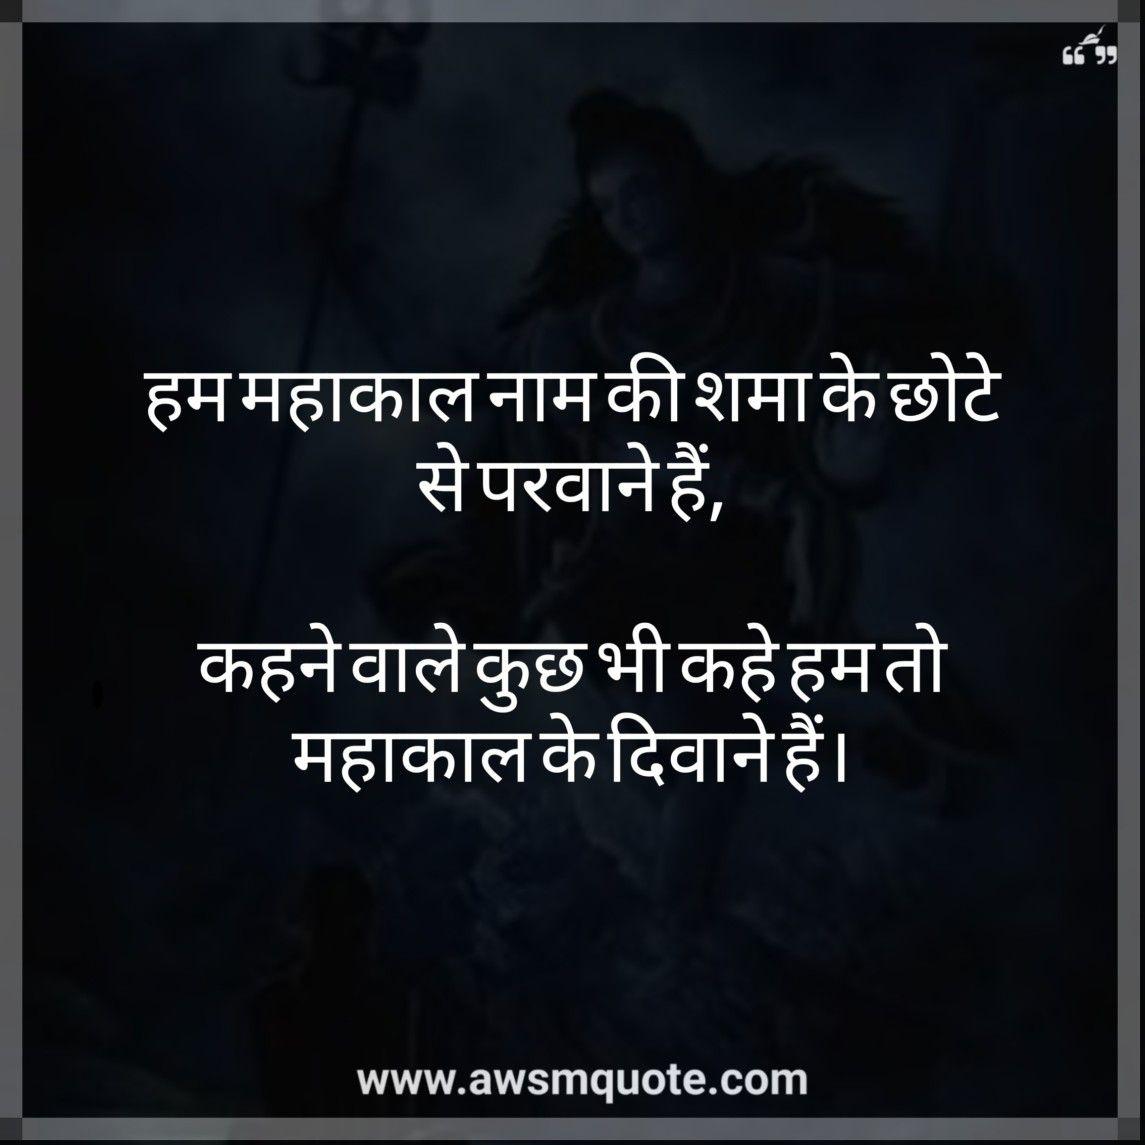 Top 50 Mahakal Attitude Status Image Hindi For Facebook Whatsapp Status Mahadev Quotes Friendship Quotes Funny Best Friendship Quotes